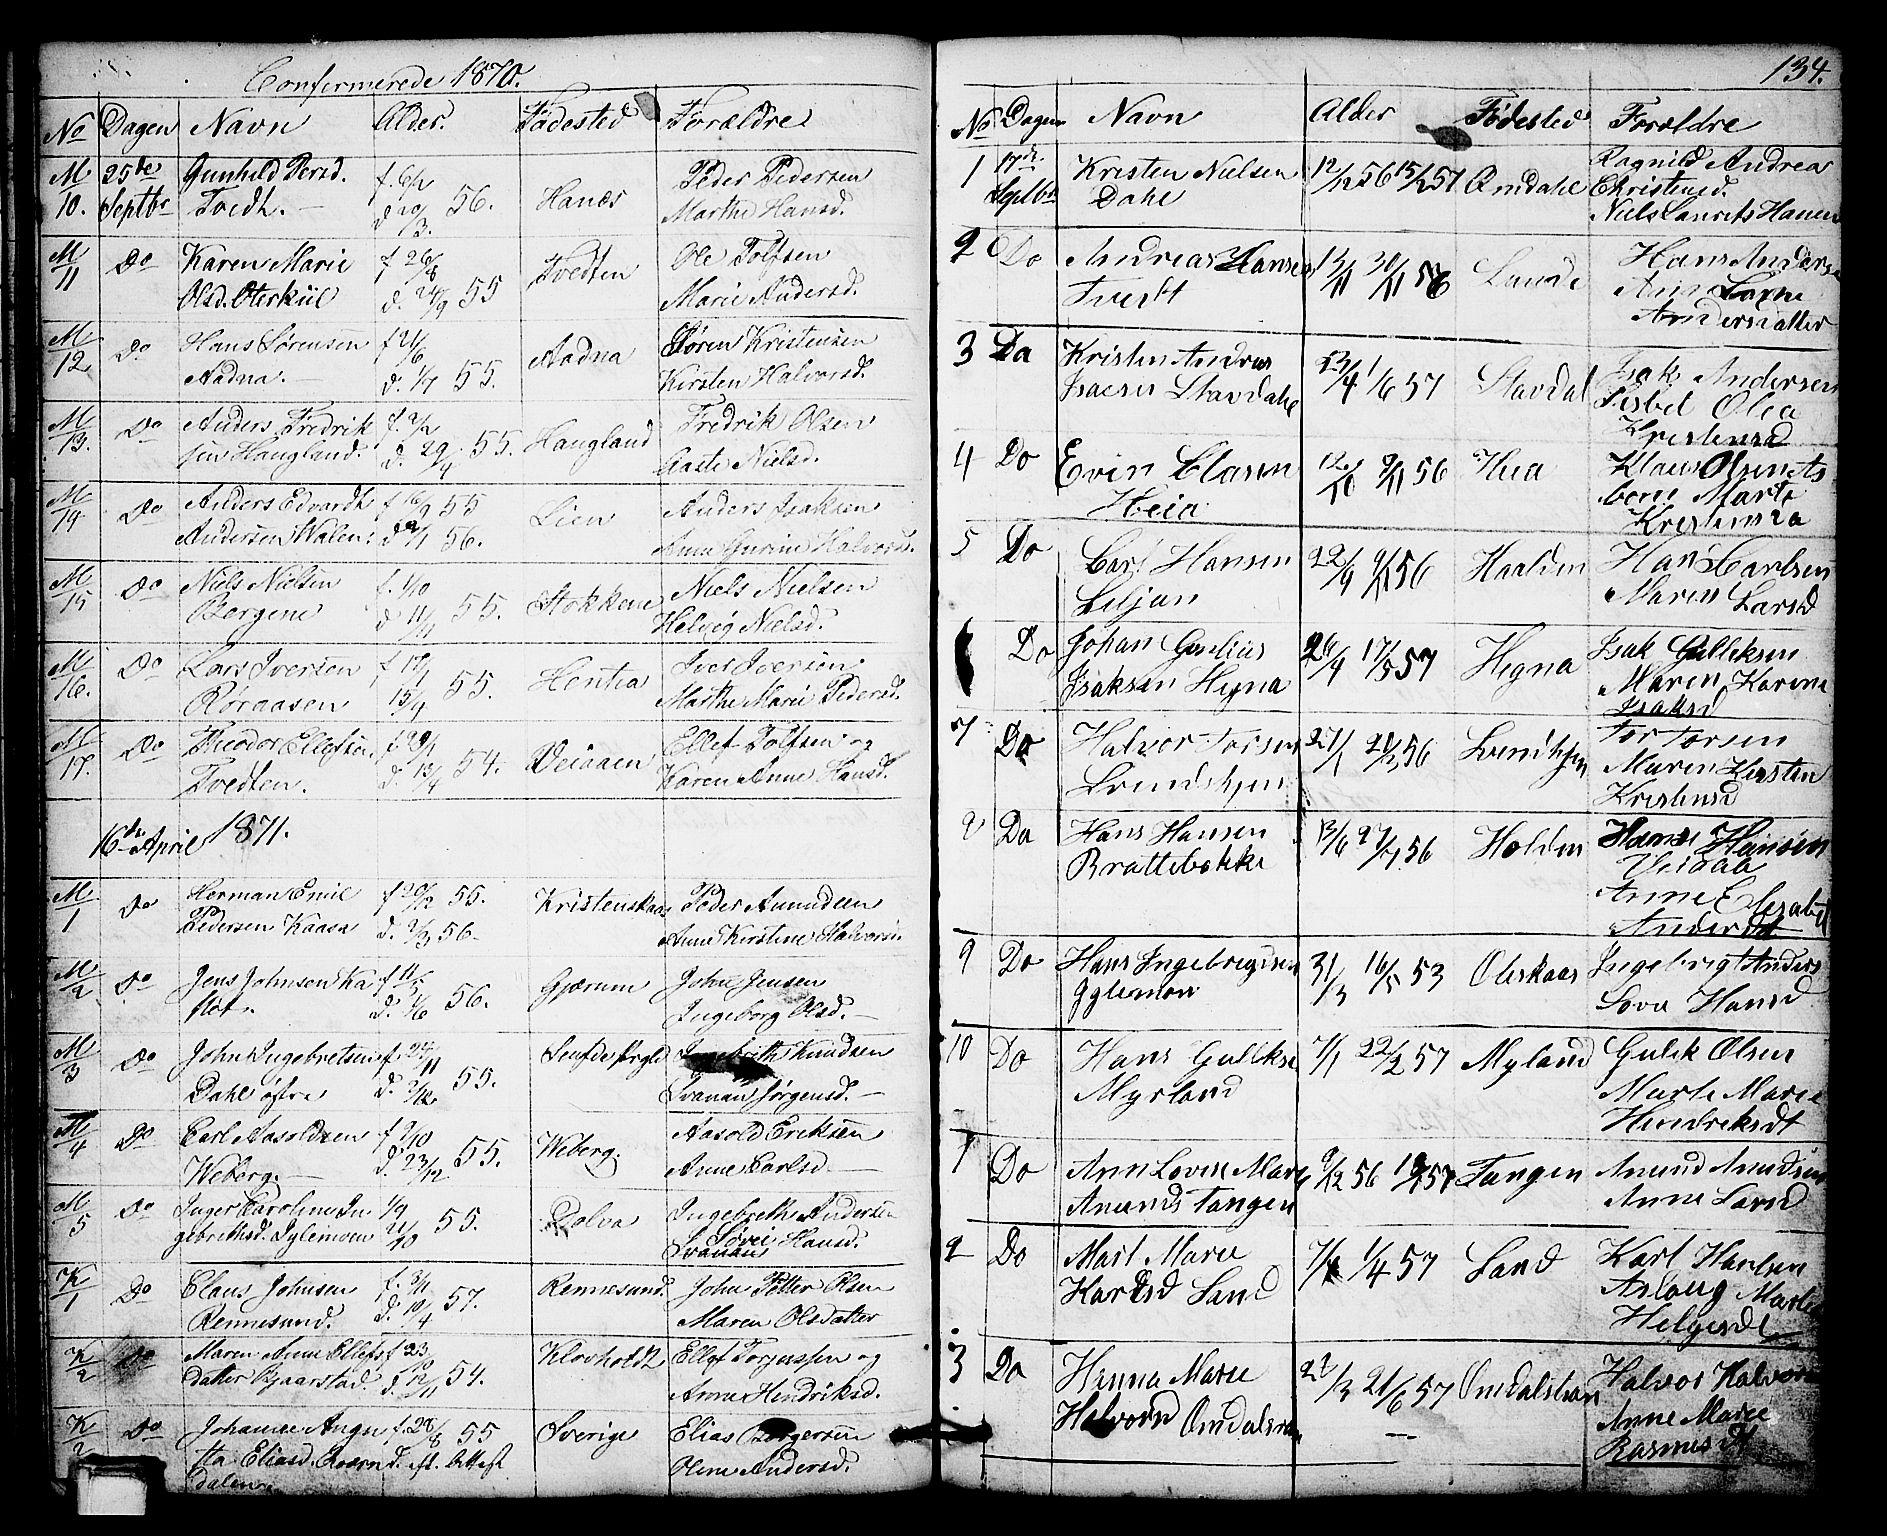 SAKO, Solum kirkebøker, G/Gb/L0002: Klokkerbok nr. II 2, 1859-1879, s. 134